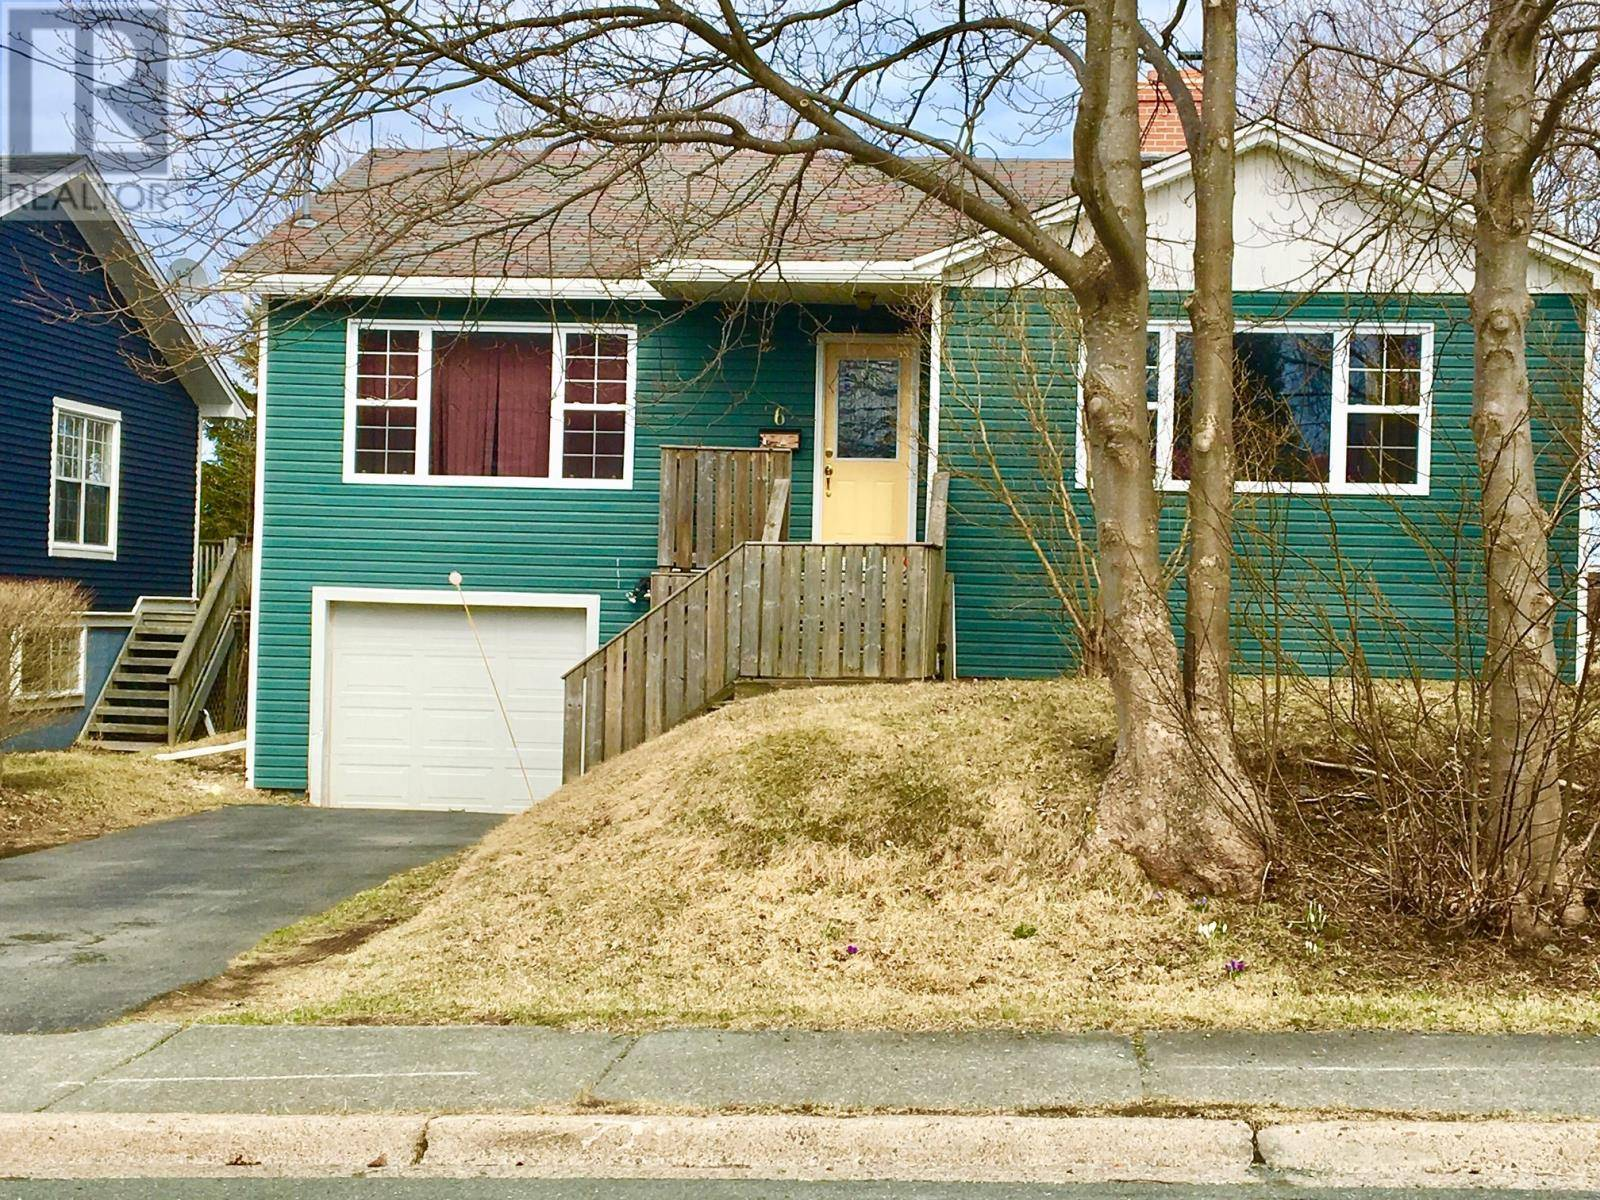 House for sale at 6 Abraham St St. John's Newfoundland - MLS: 1209364